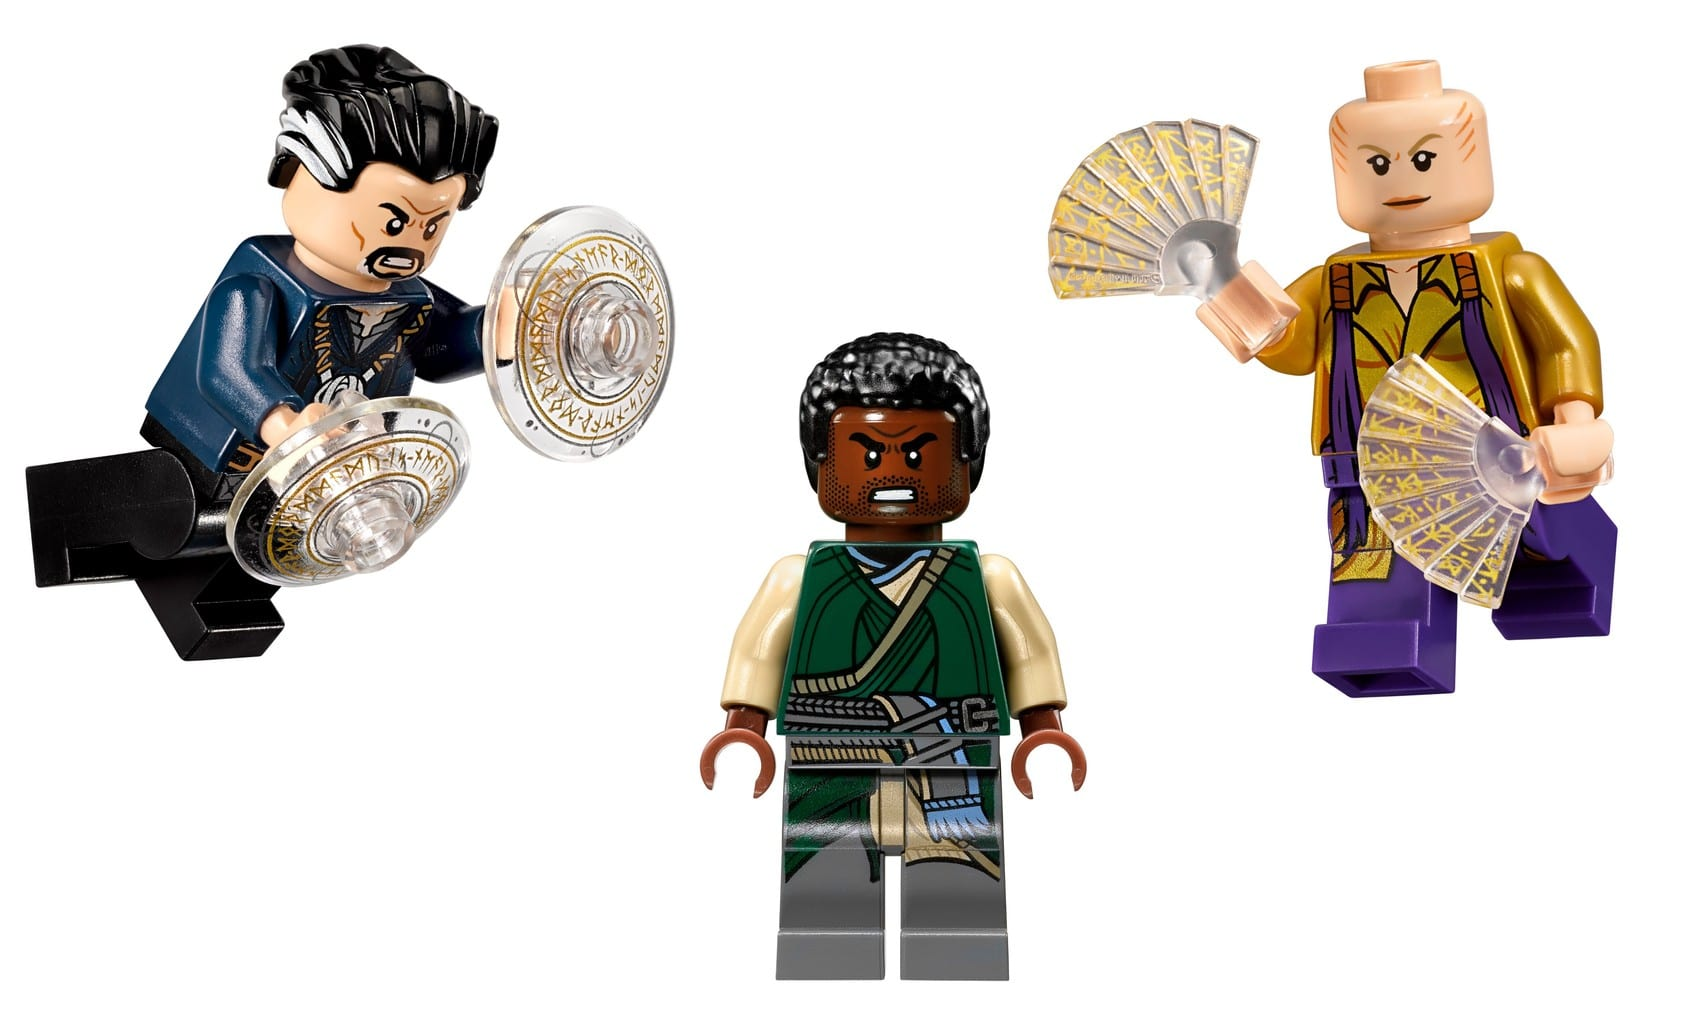 LEGO Marvel Super Heroes KARL MORDO Minifigure from 76060